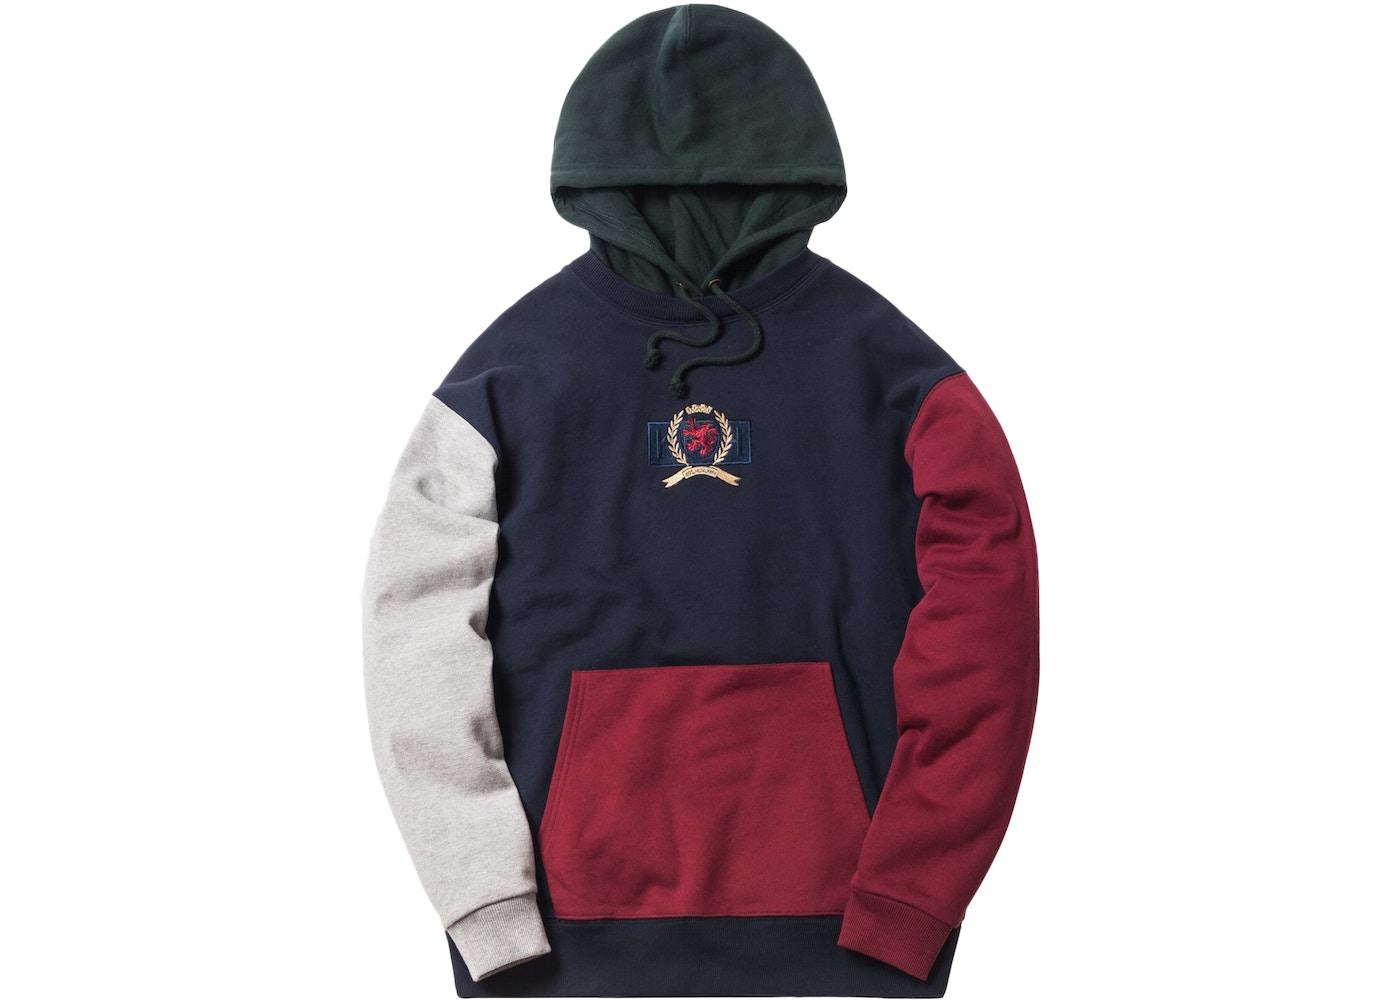 1d3ba0004e5f6 Kith Tops Sweatshirts - Buy   Sell Streetwear